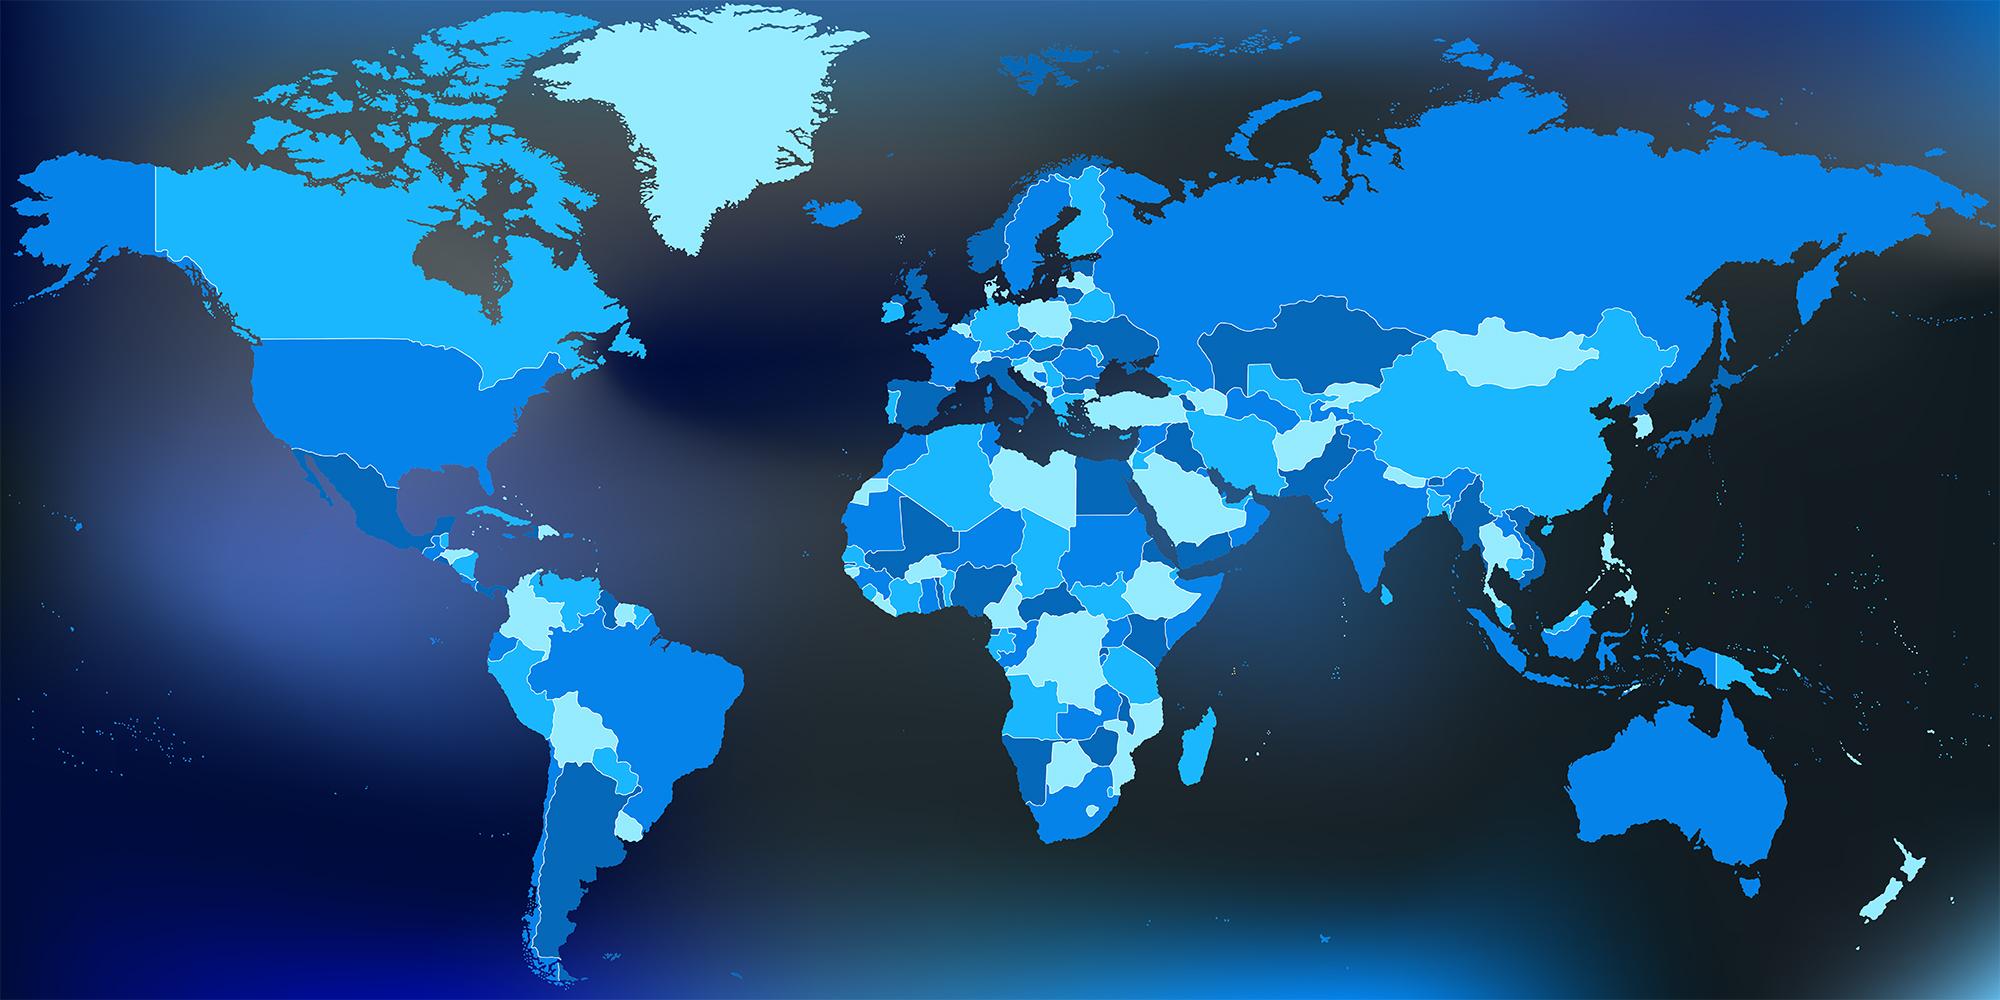 Dark map of the entire world.